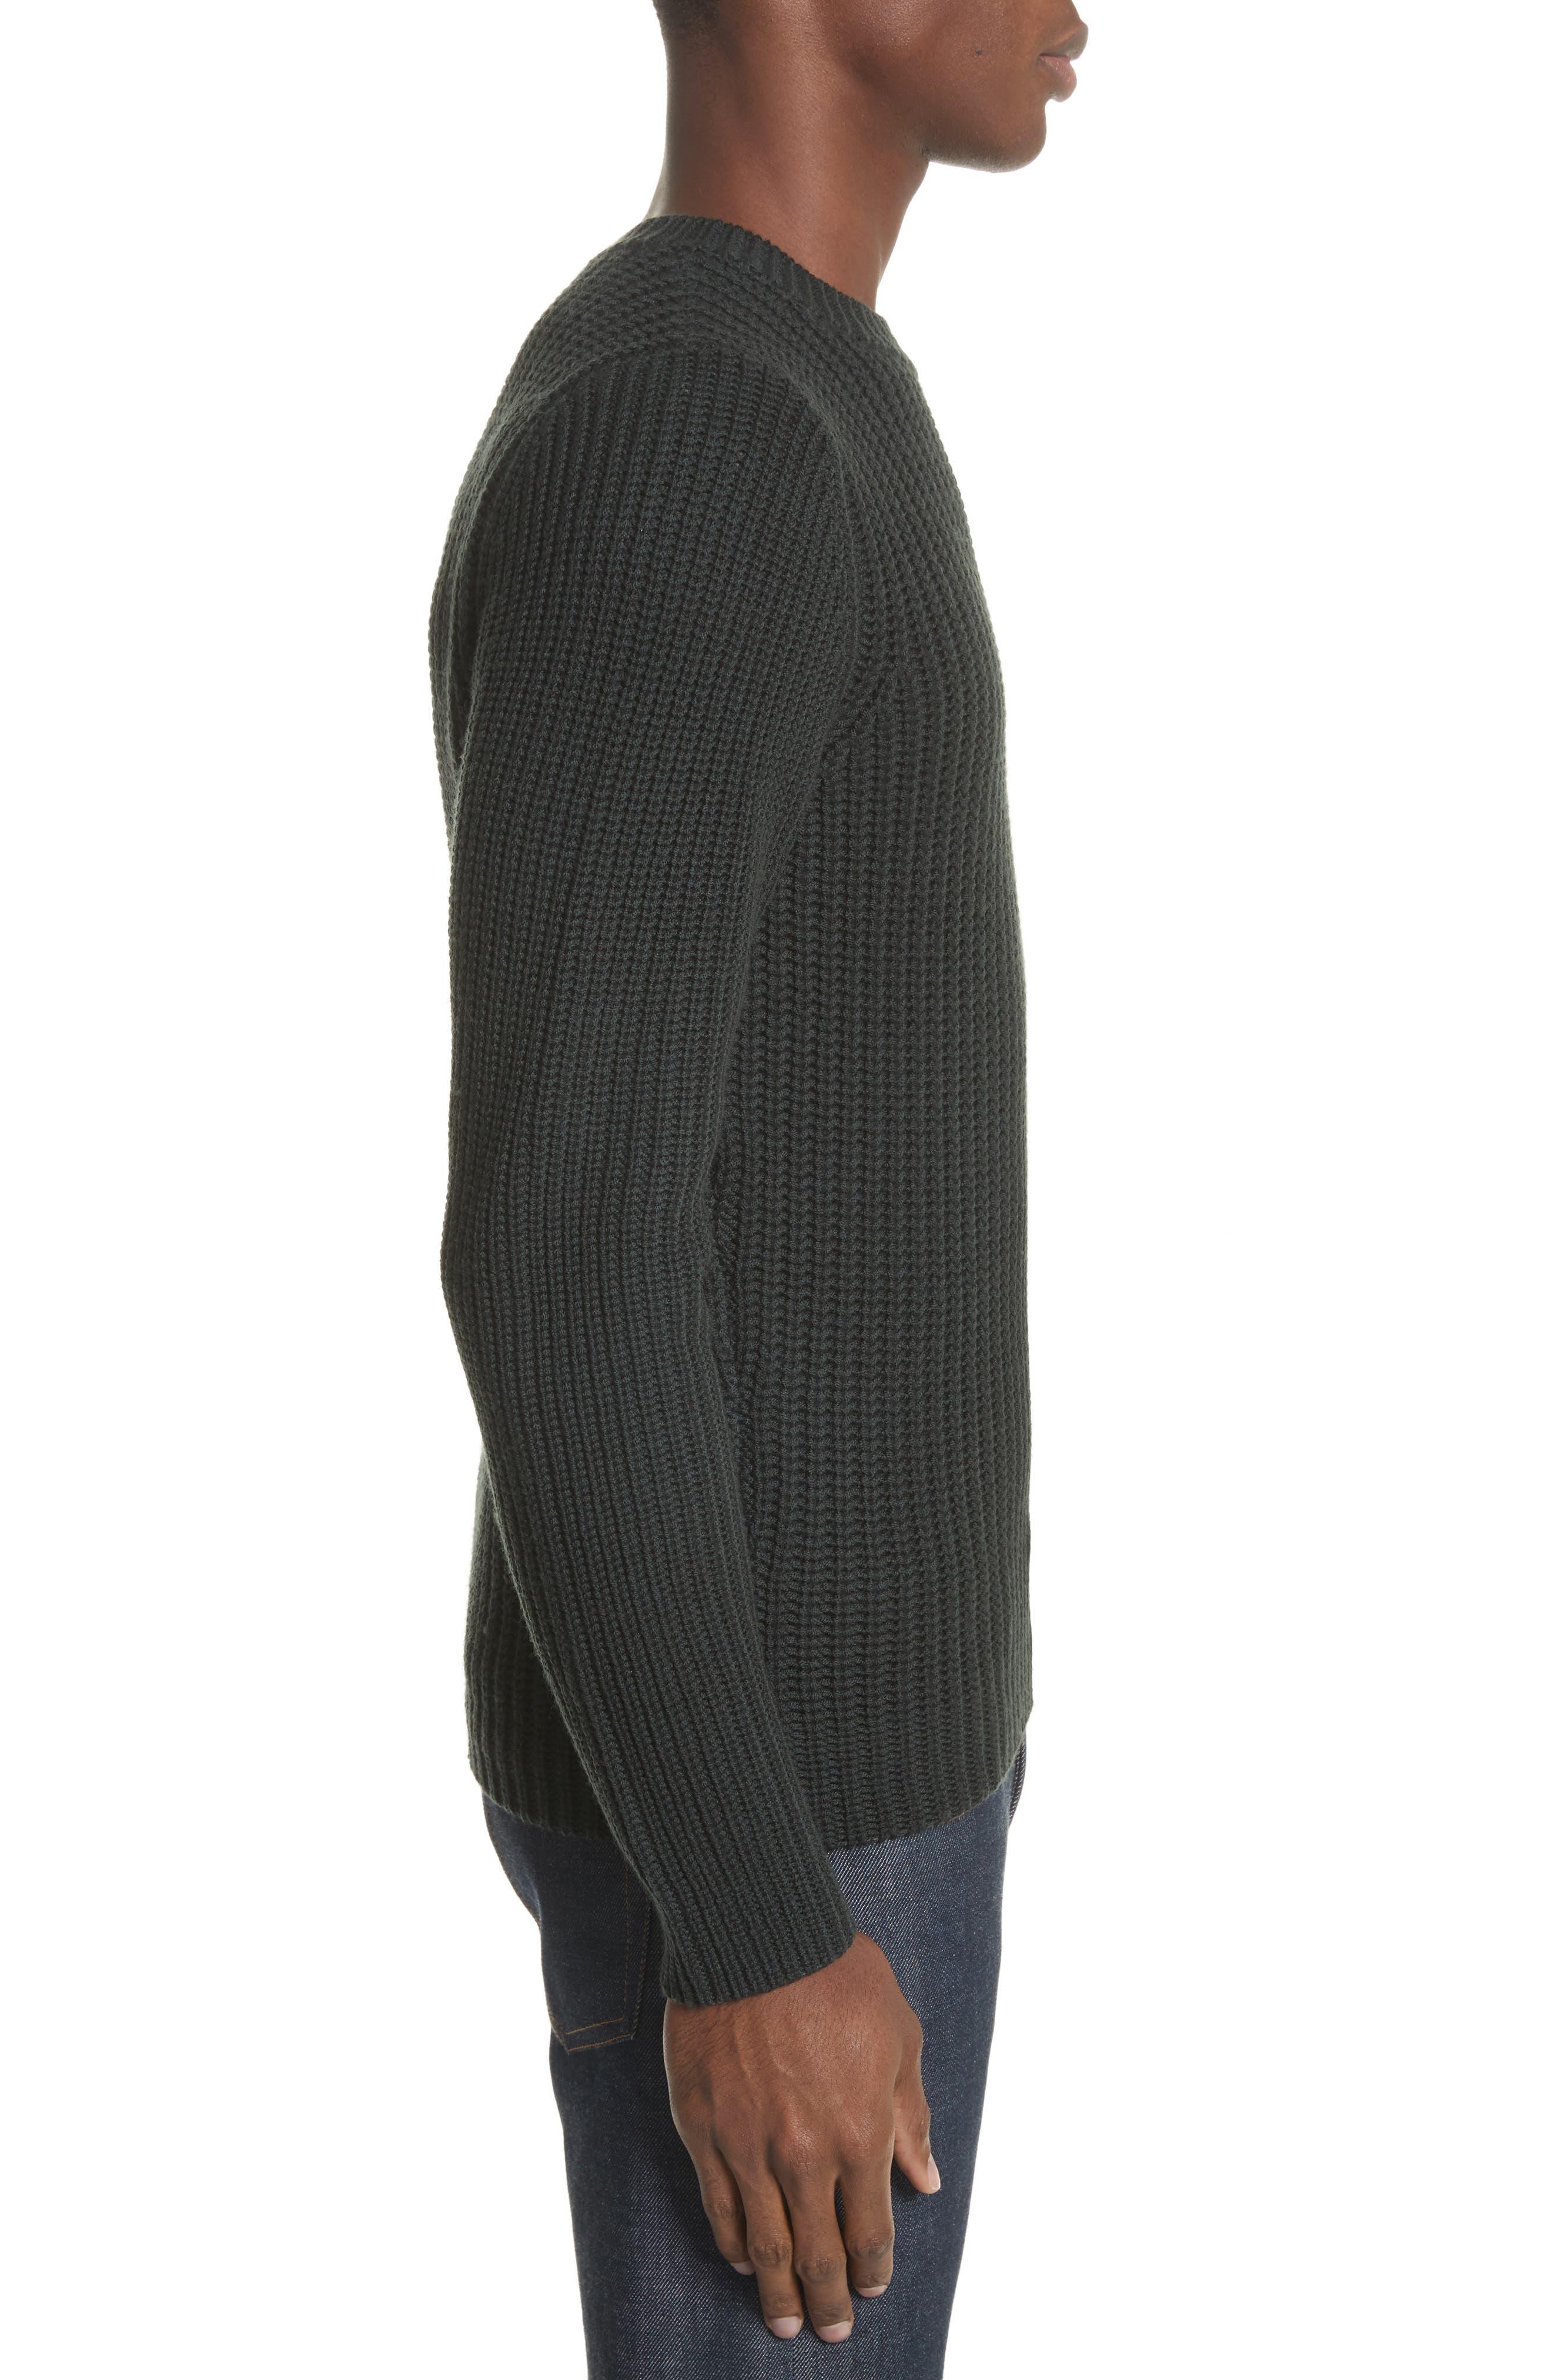 Pull Berger Merino Wool Sweater,                             Alternate thumbnail 3, color,                             300